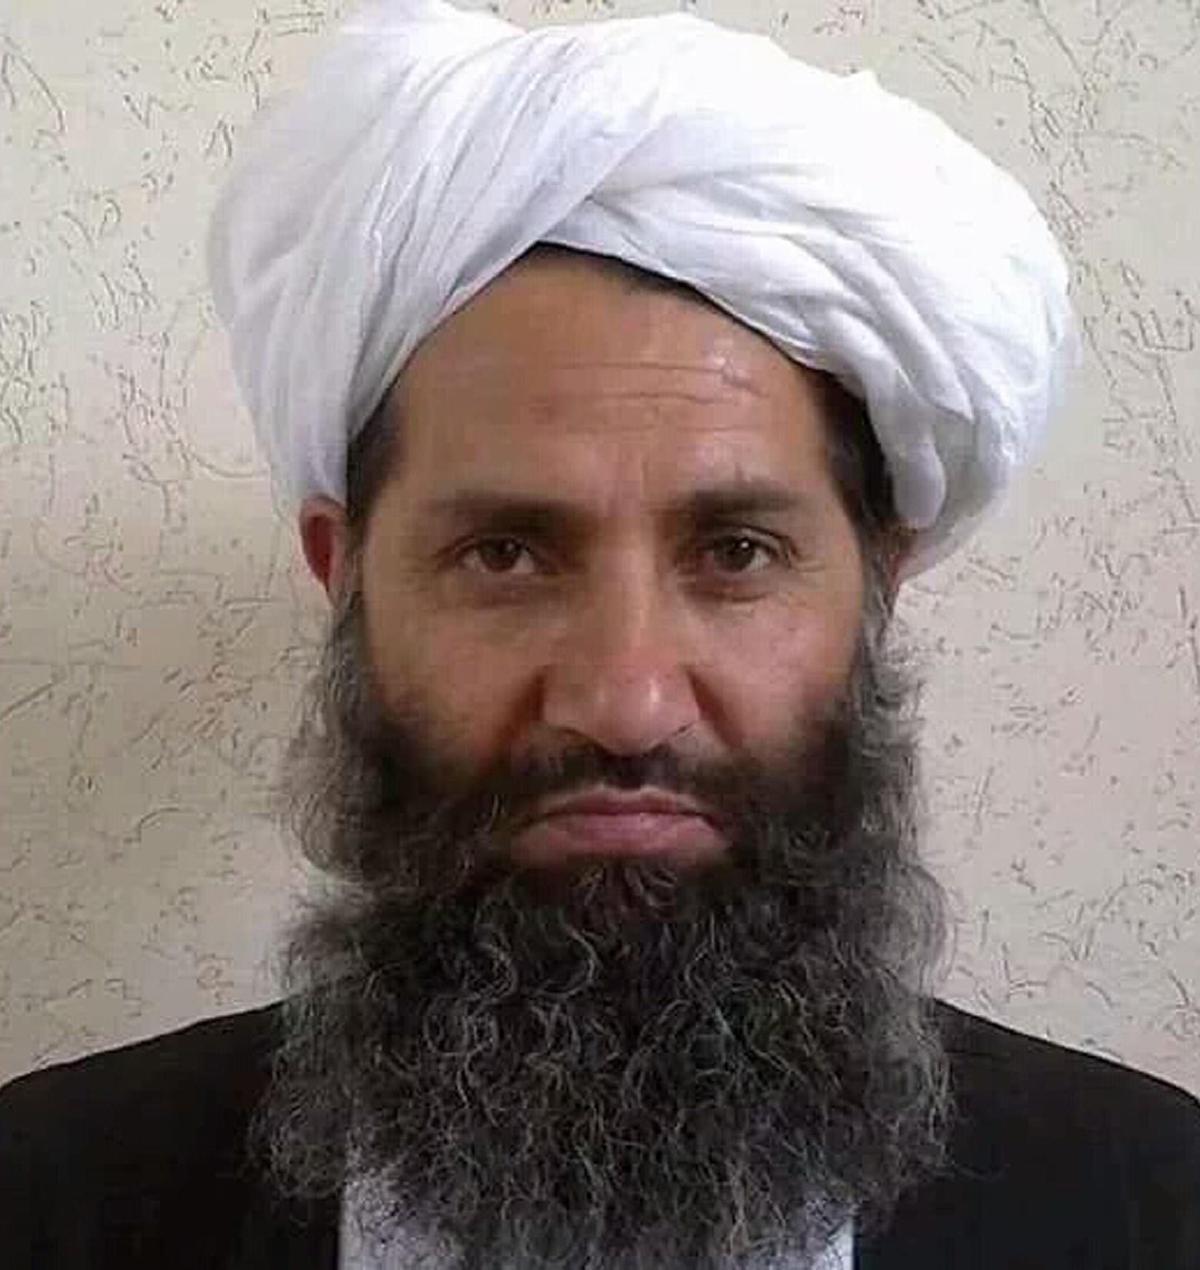 Taliban's most brutal leader, Hibatullah Akhundzada becomes Afghanistan's president, people terrorised